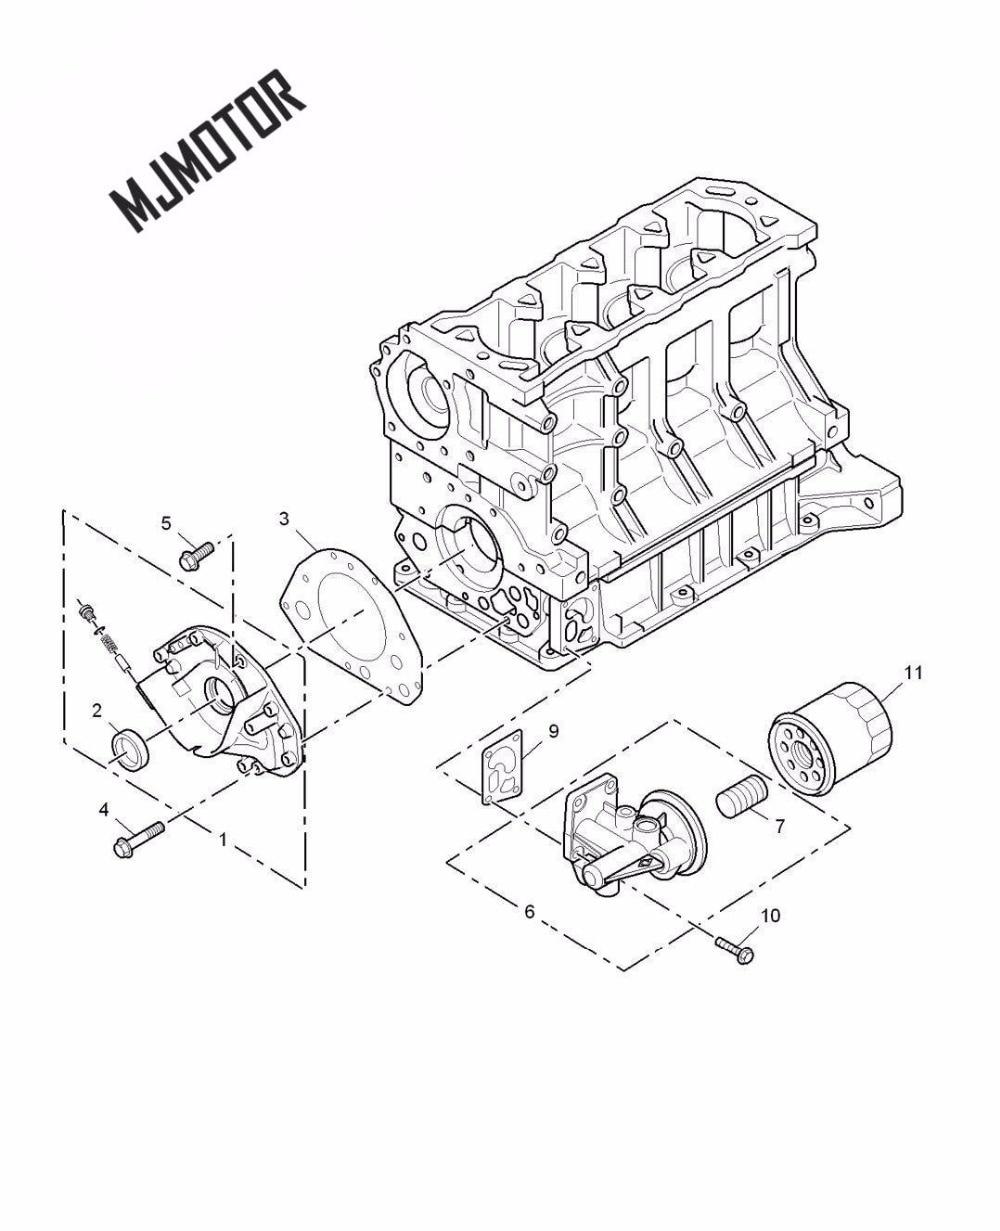 medium resolution of vw 2 0t fsi engine diagram wiring library 1 8t engine diagram oil pump automotive wiring